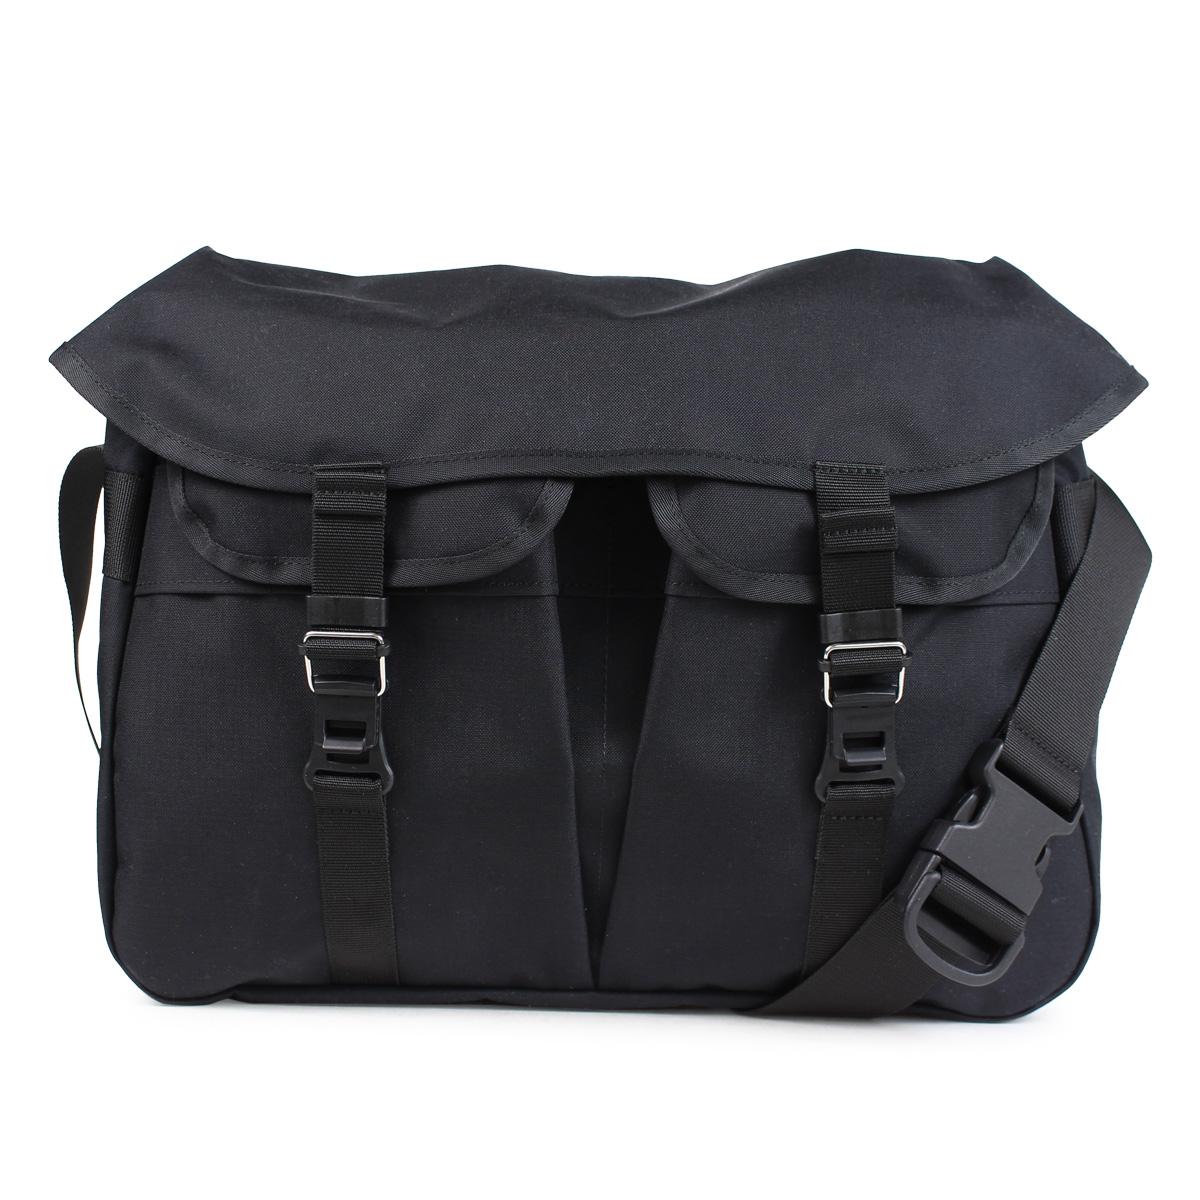 bagjack HNTR BAG バッグジャック メッセンジャーバッグ ショルダーバッグ メンズ レディース ブラック [191]